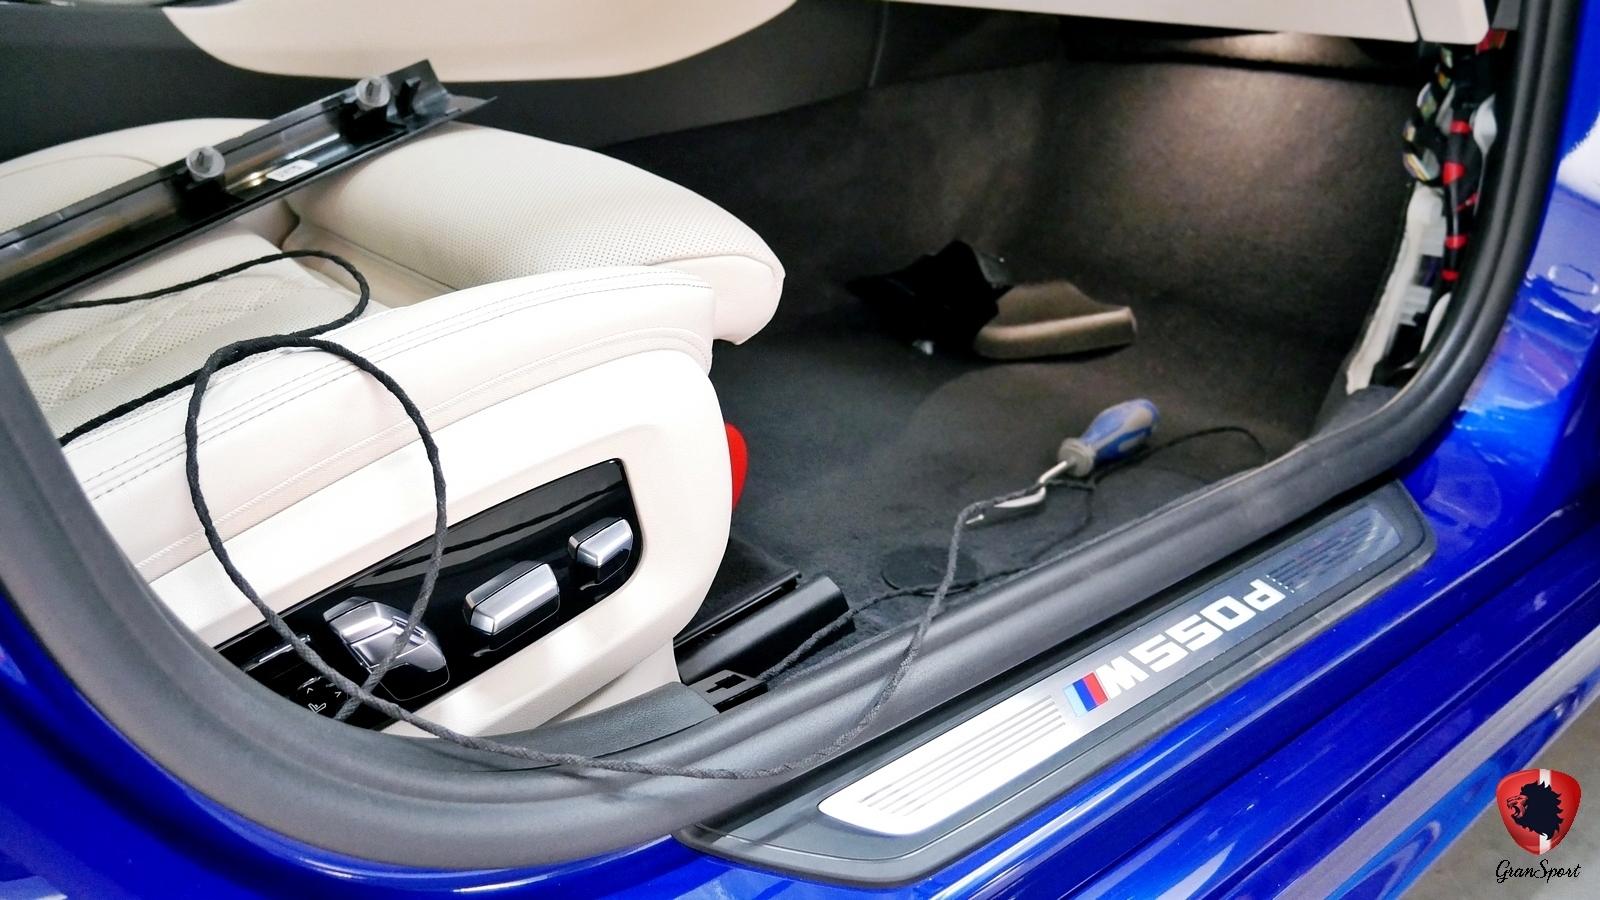 BMW G31 Maxhaust